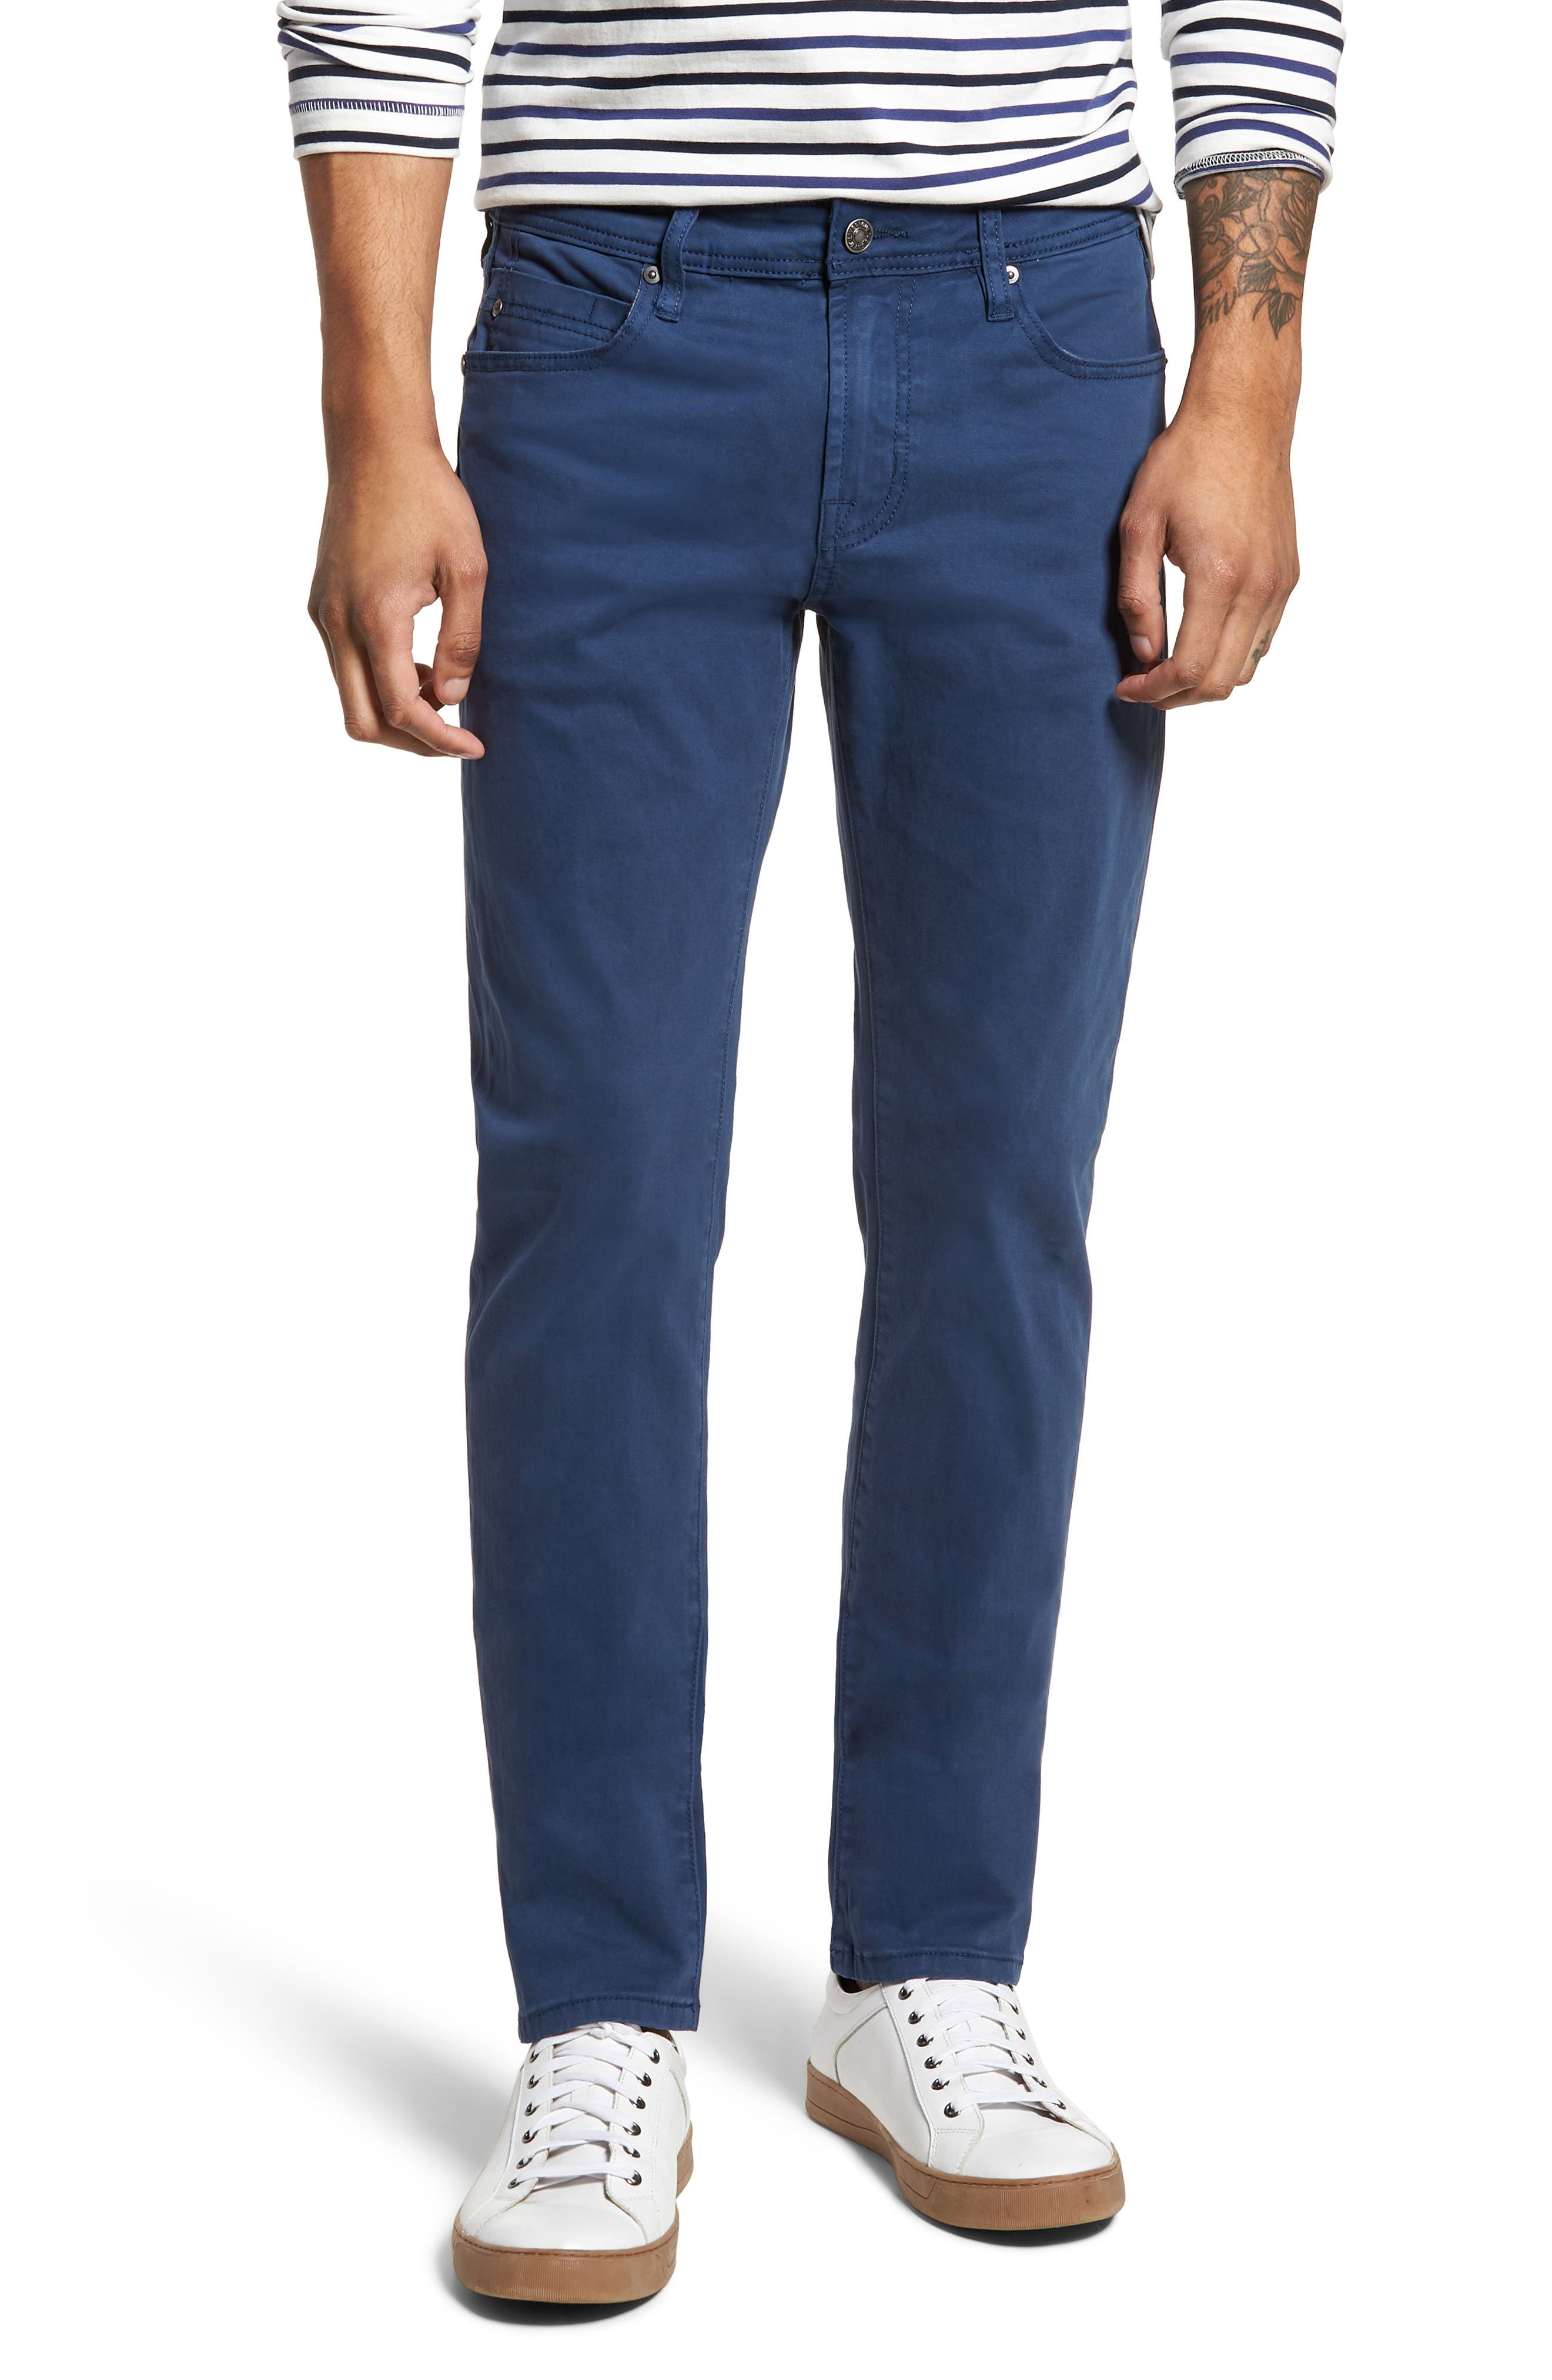 Jeans Co. Kingston Slim Straight Leg Jeans,                         Main,                         color, BLUE TWILIGHT